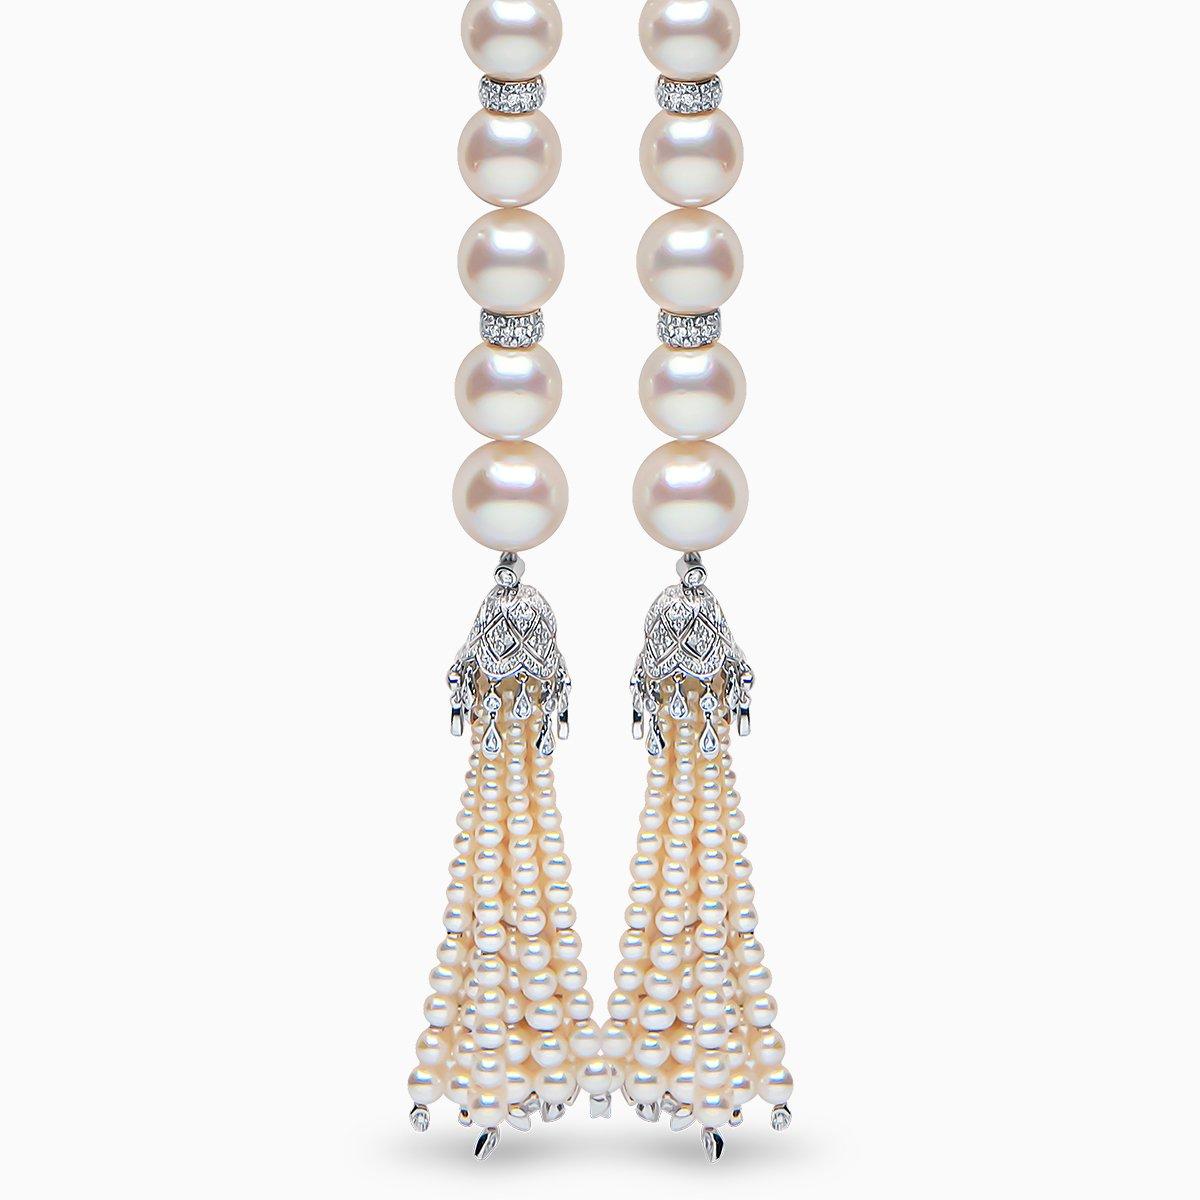 Yoko London Tassel Diamond, Freshwater Pearl and South Sea Pearl Necklace